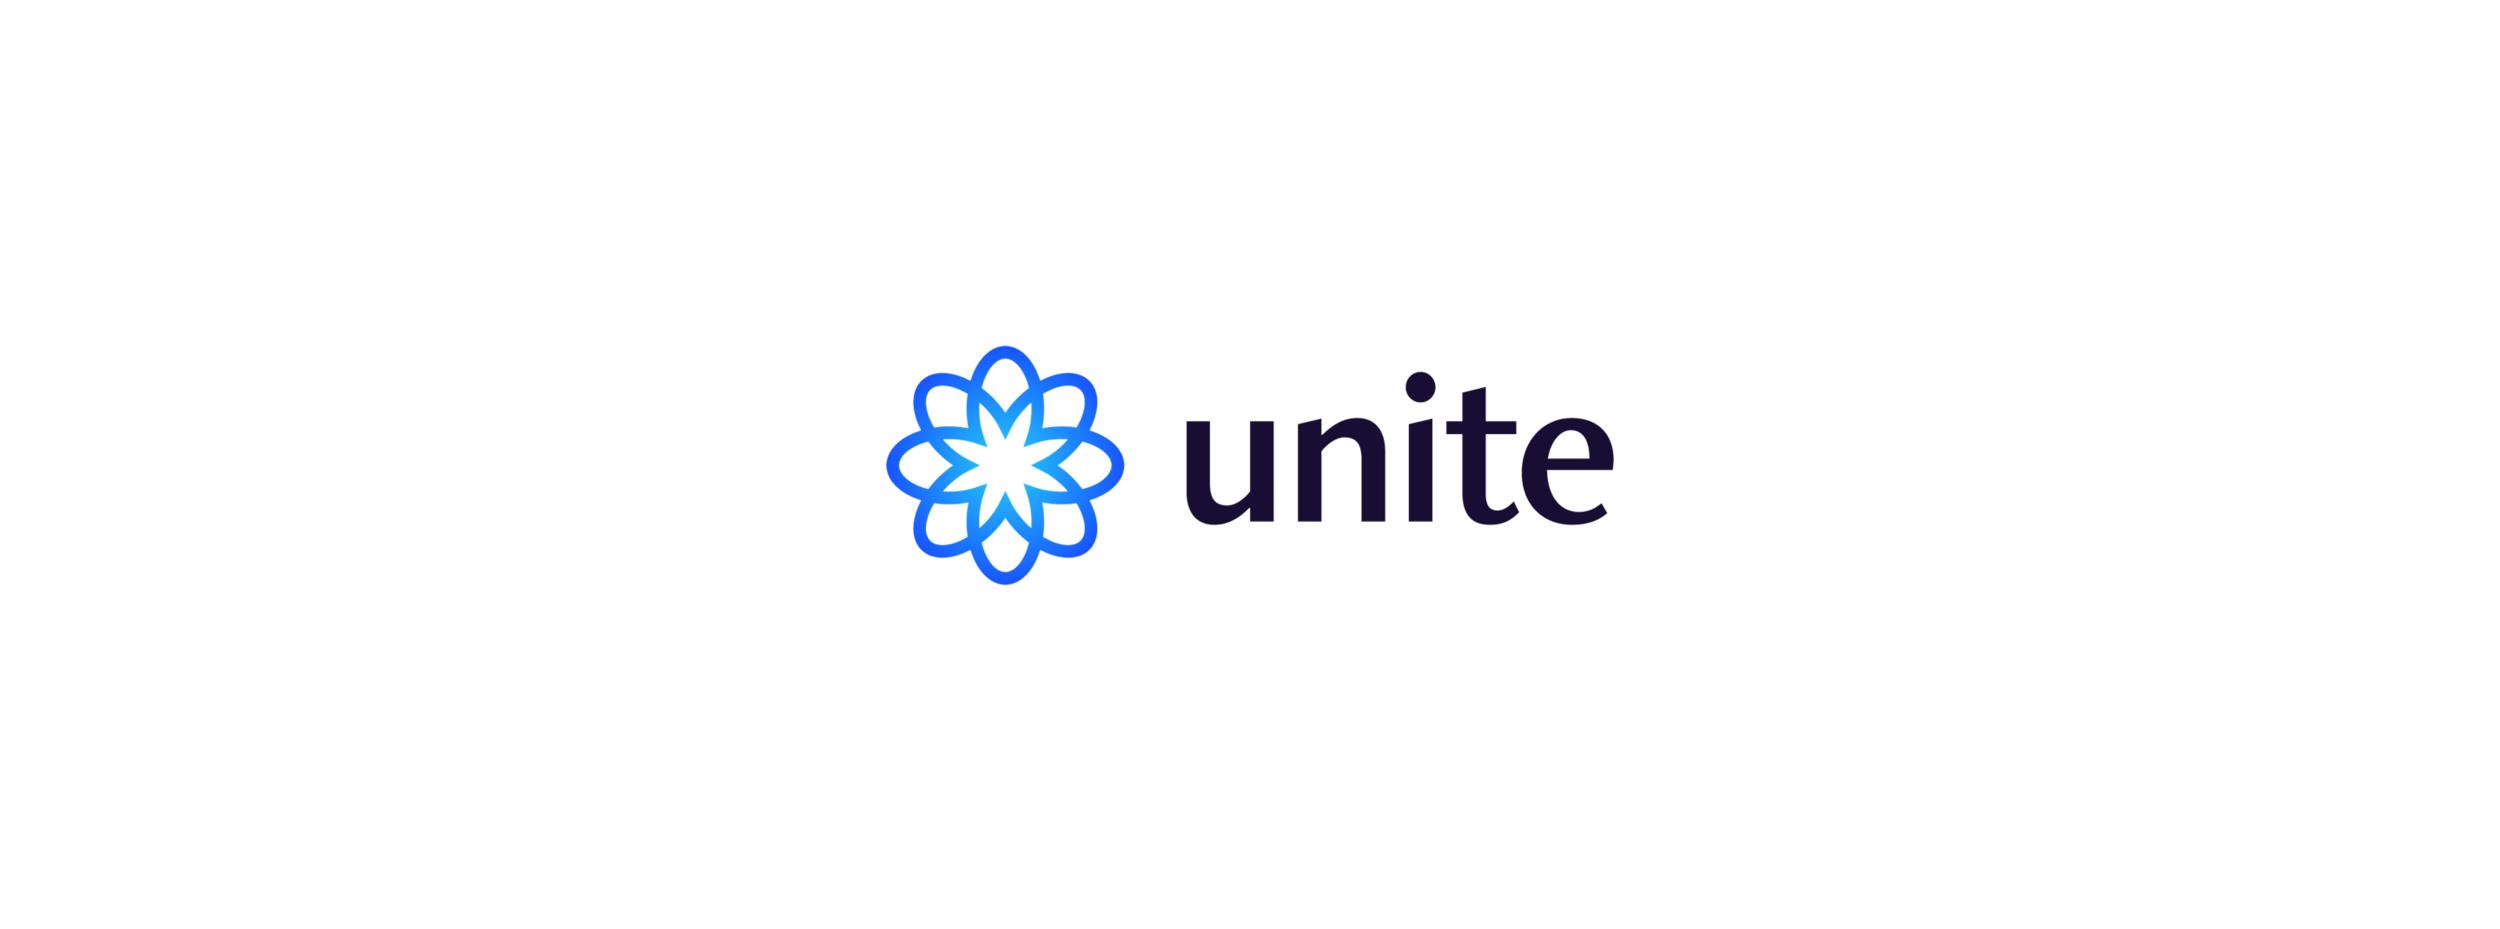 unite-genomics-branding-9.png